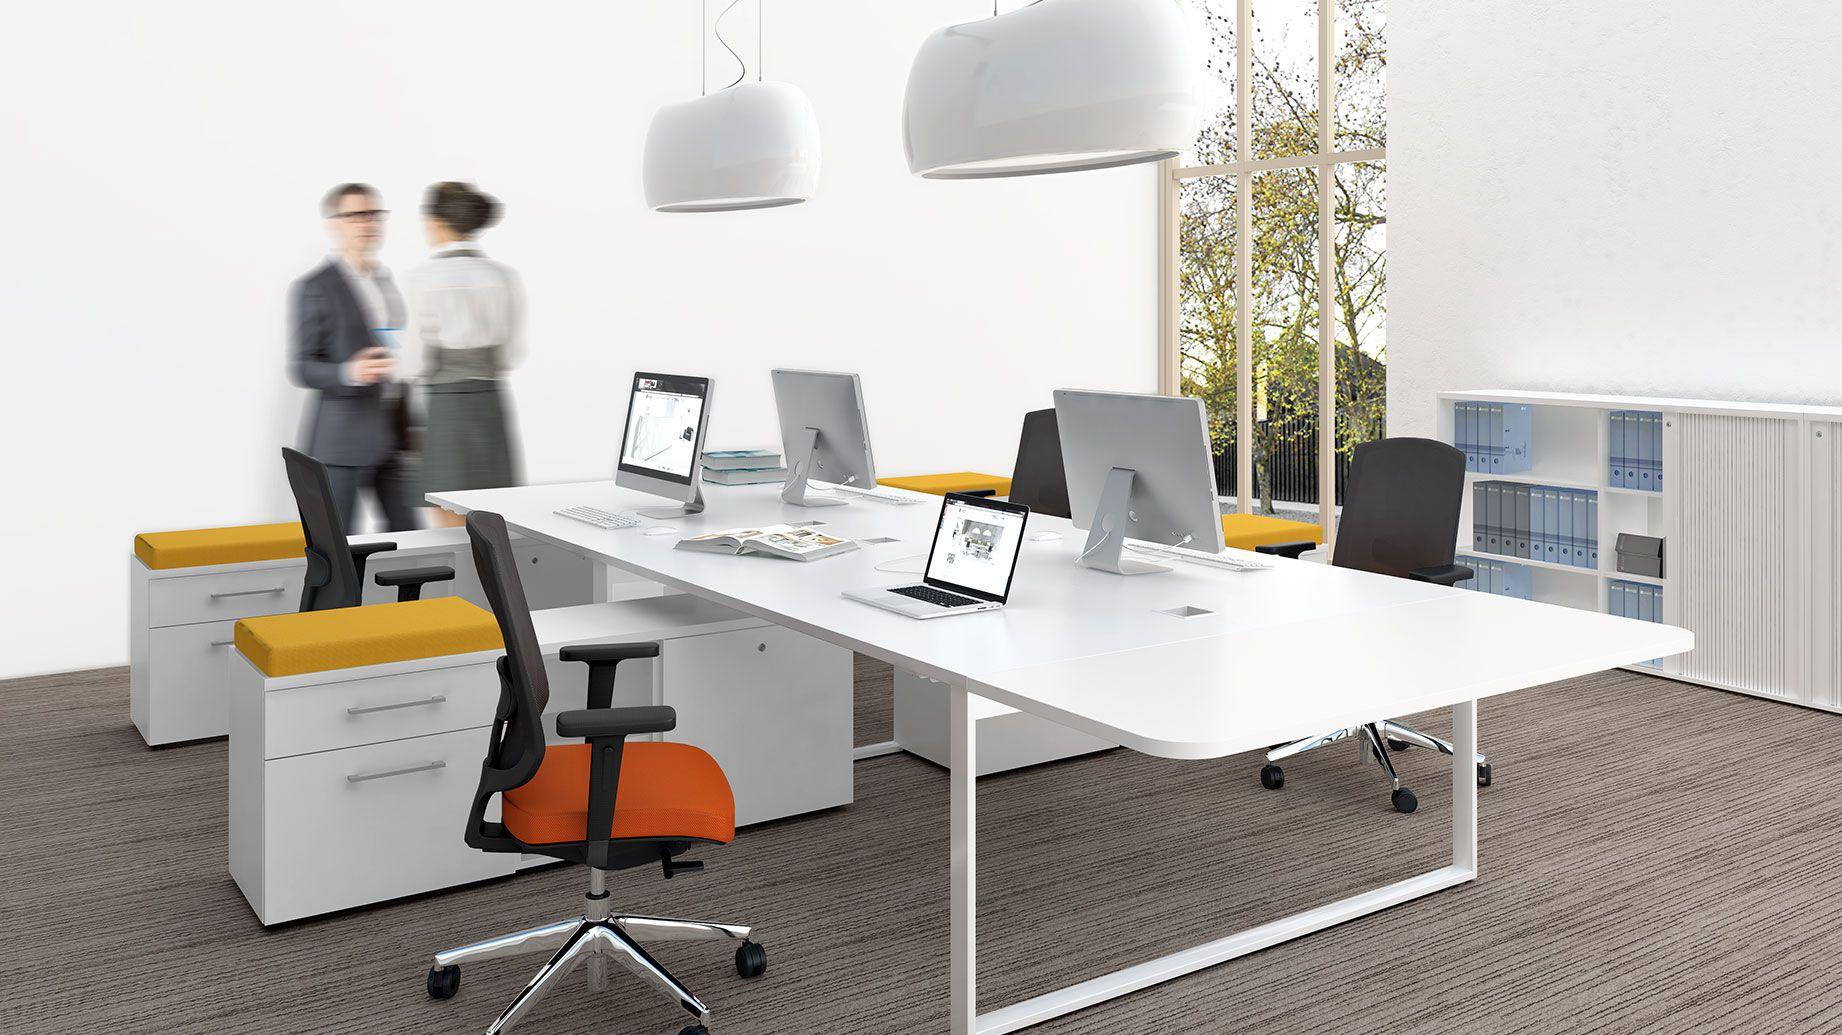 meble biurowe gabinetowe producent nowoczesne biurka do